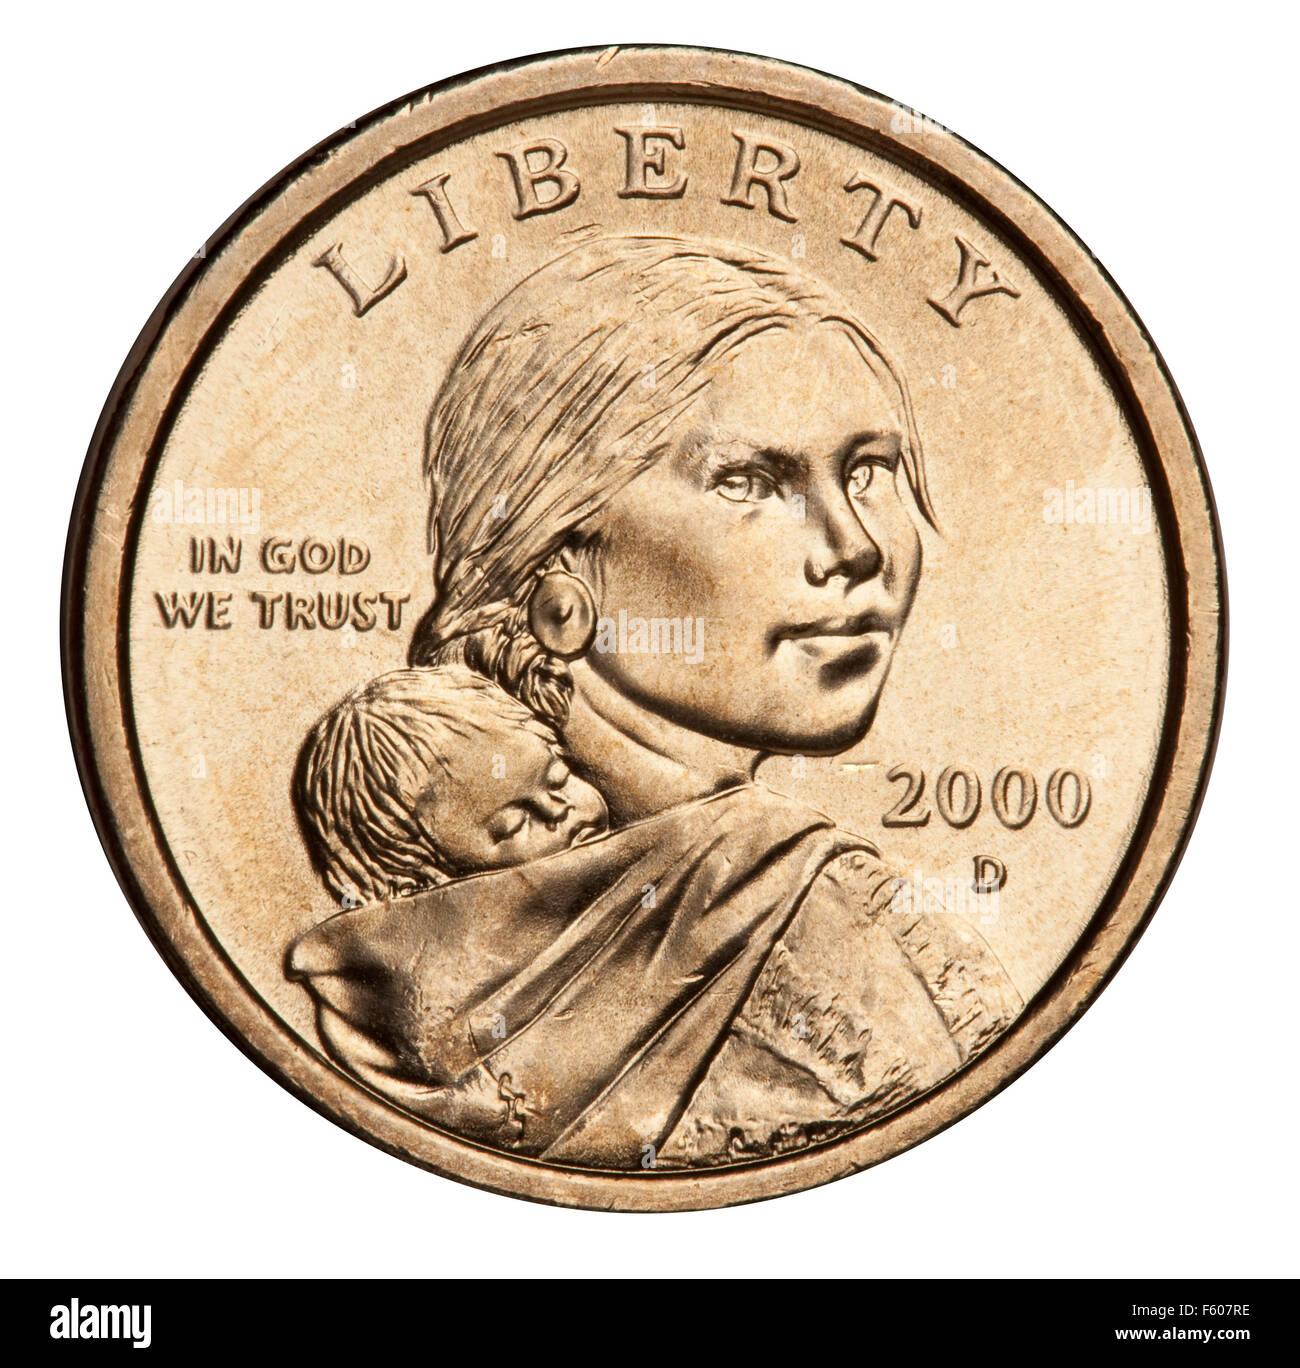 Sacagawea dollar coin 2000-2008: Glenna Goodacre's portrait of Sacagawea carrying her son Jean Baptiste Charbonneau - Stock Image